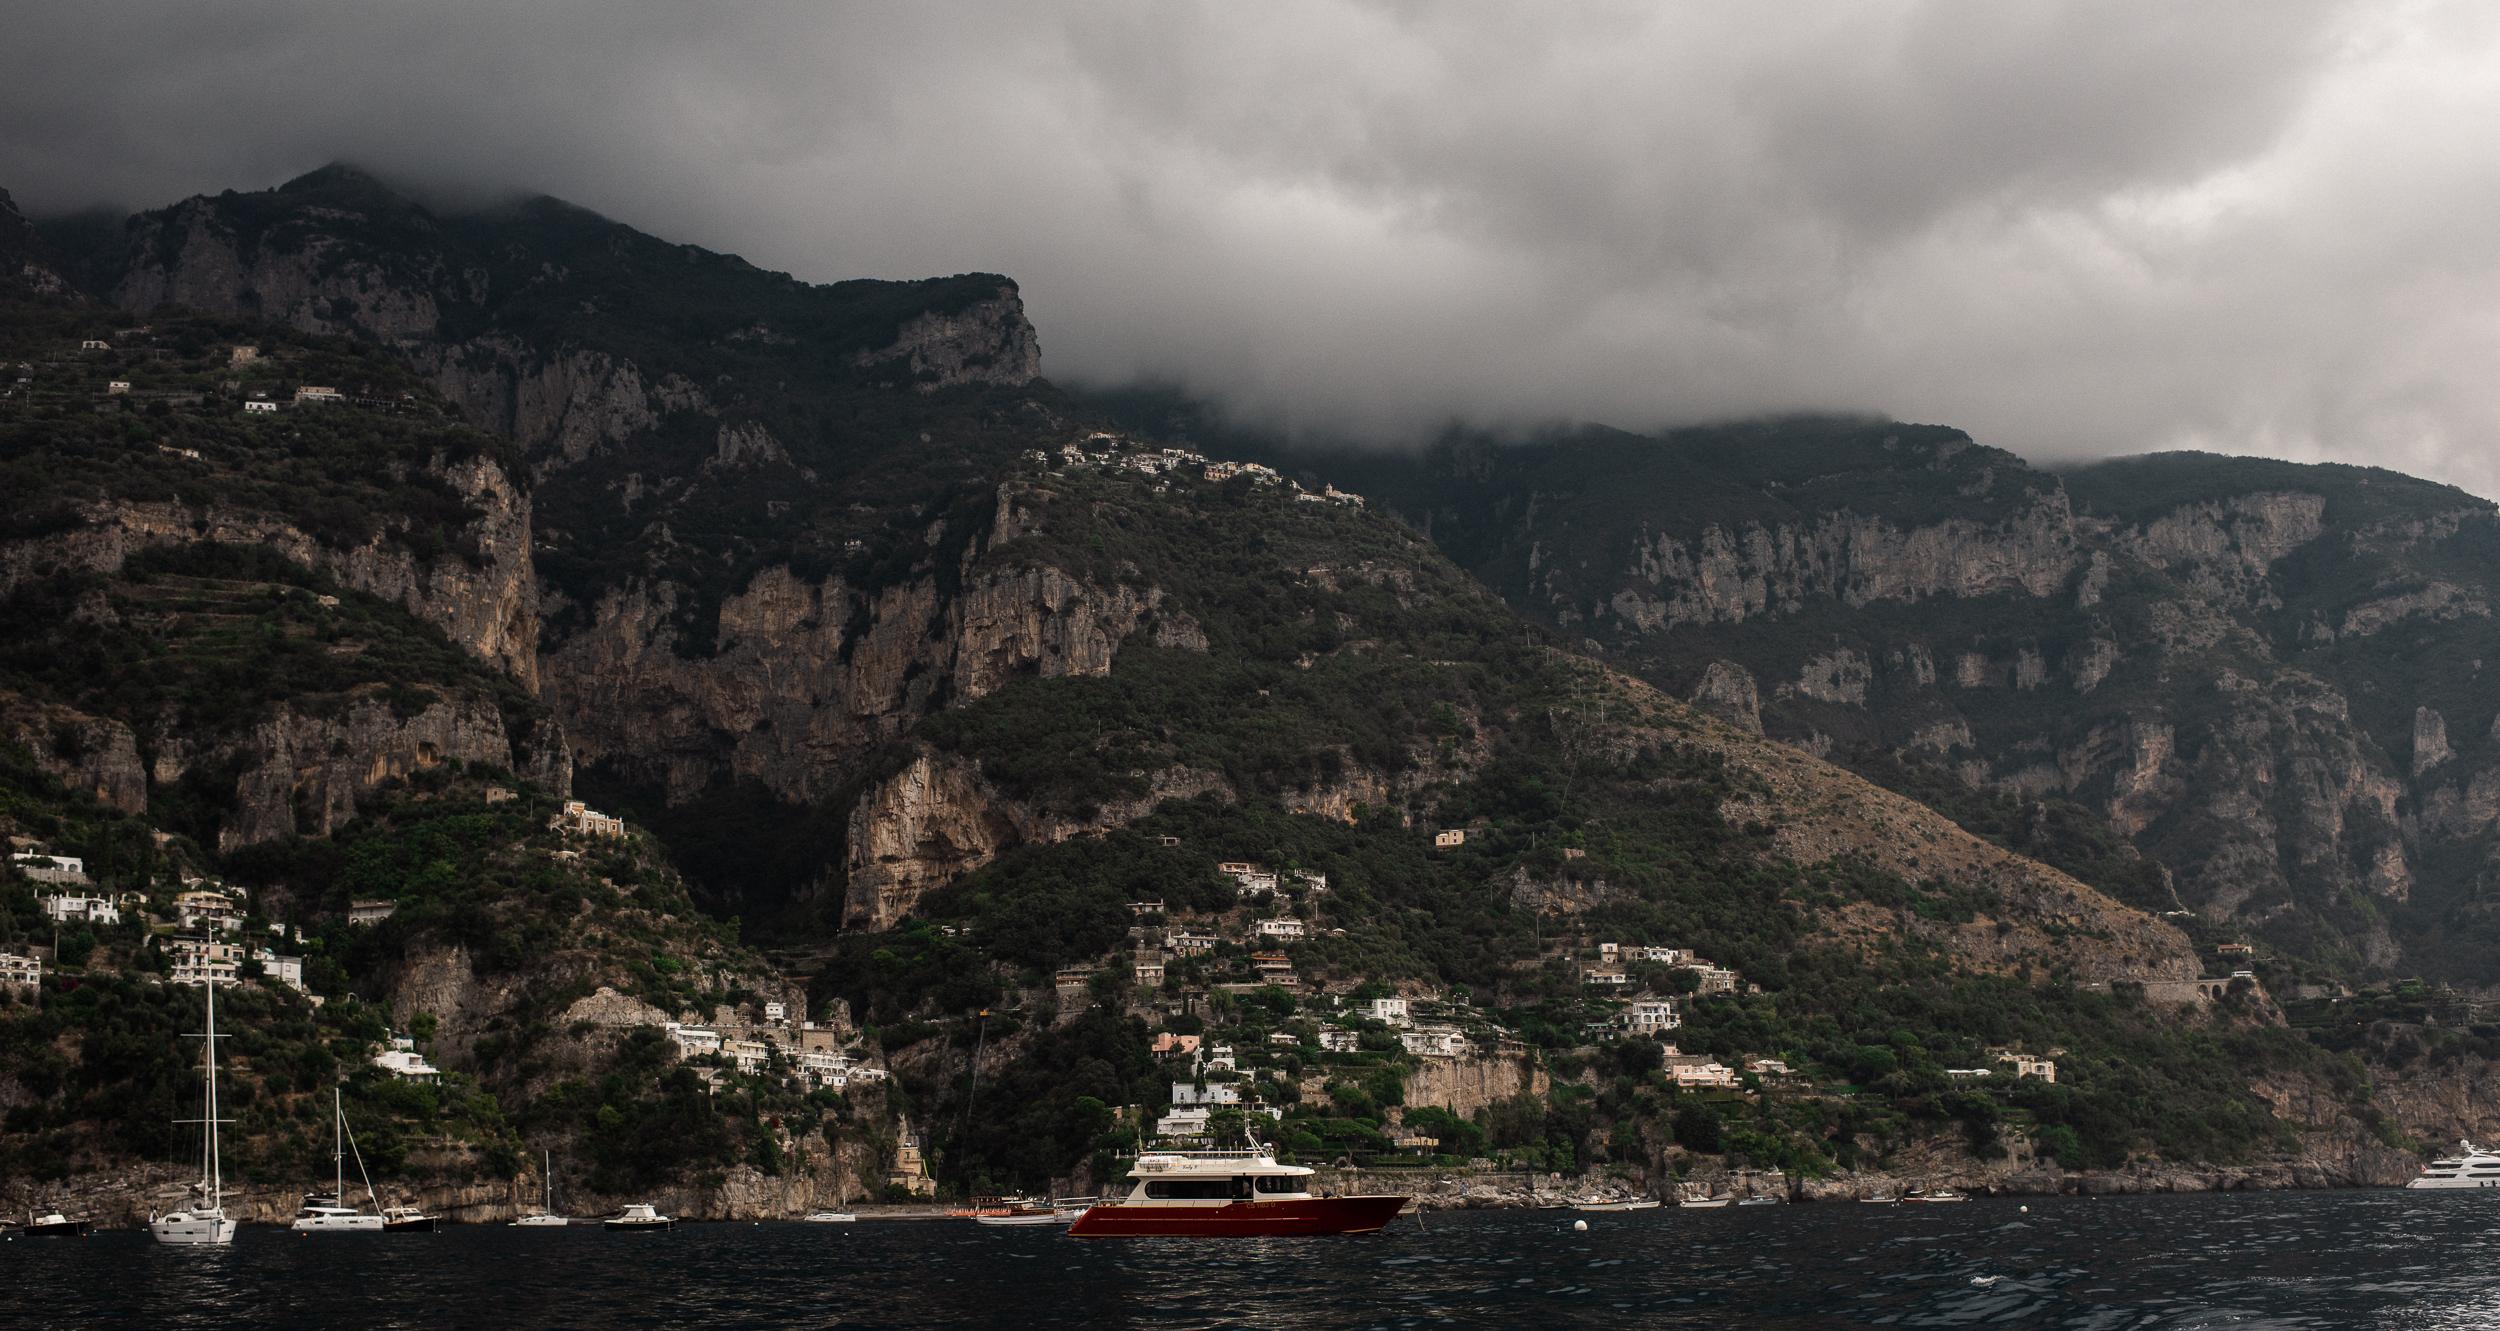 Europe_2018_ITALY_TaraShupe_Photography_DSC_4255.jpg